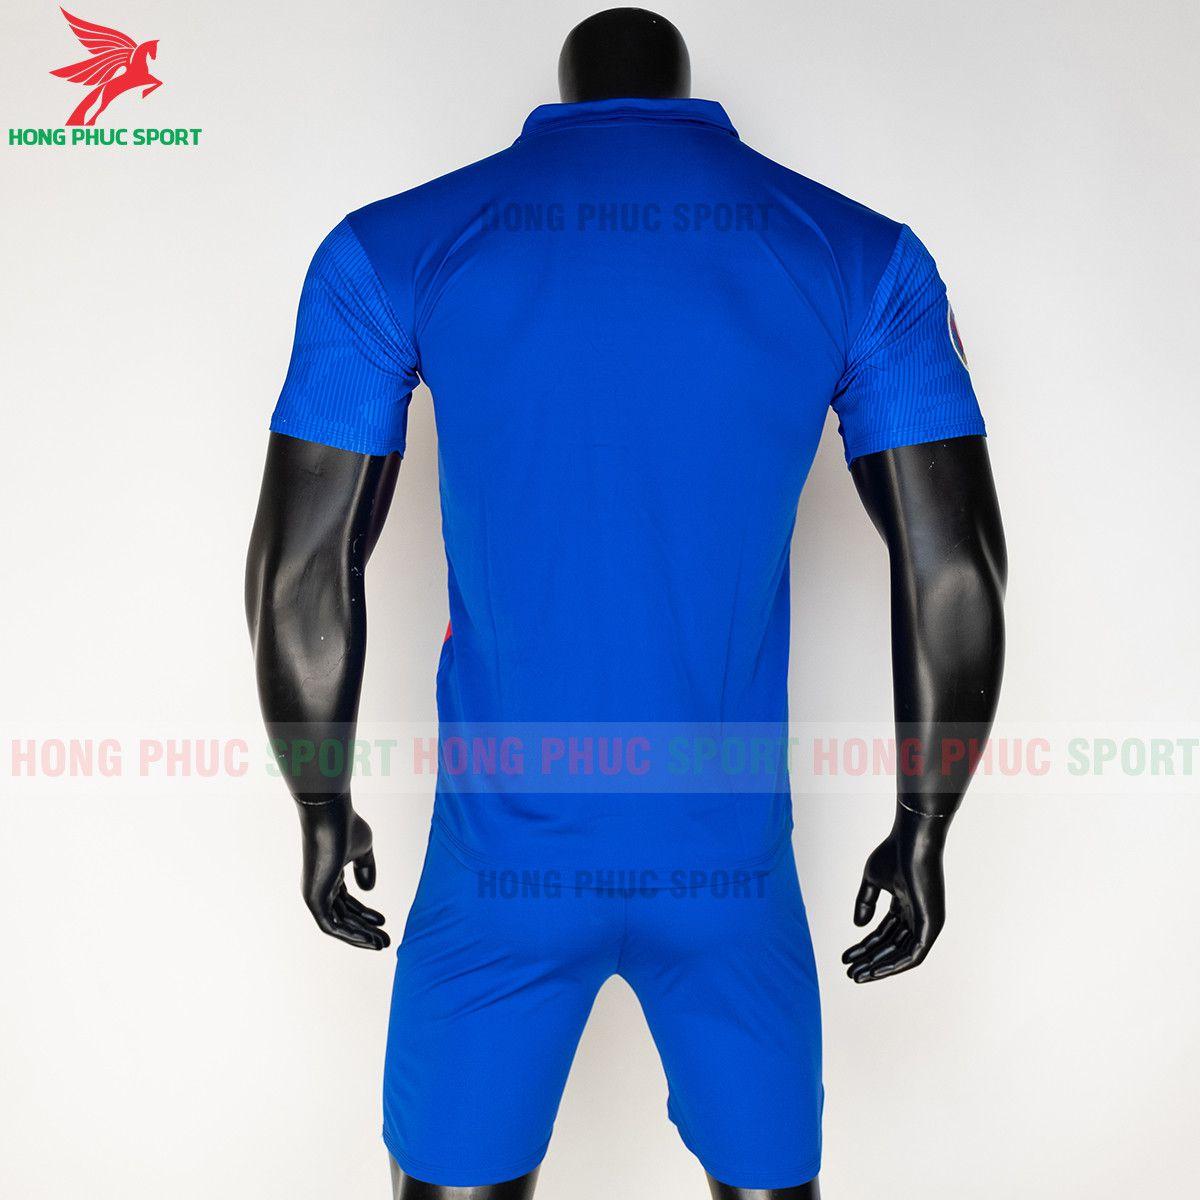 https://cdn.hongphucsport.com/unsafe/s4.shopbay.vn/files/285/ao-bong-da-tuyen-anh-euro-2021-san-khach-thun-lanh-61558aaa1b45e.jpg